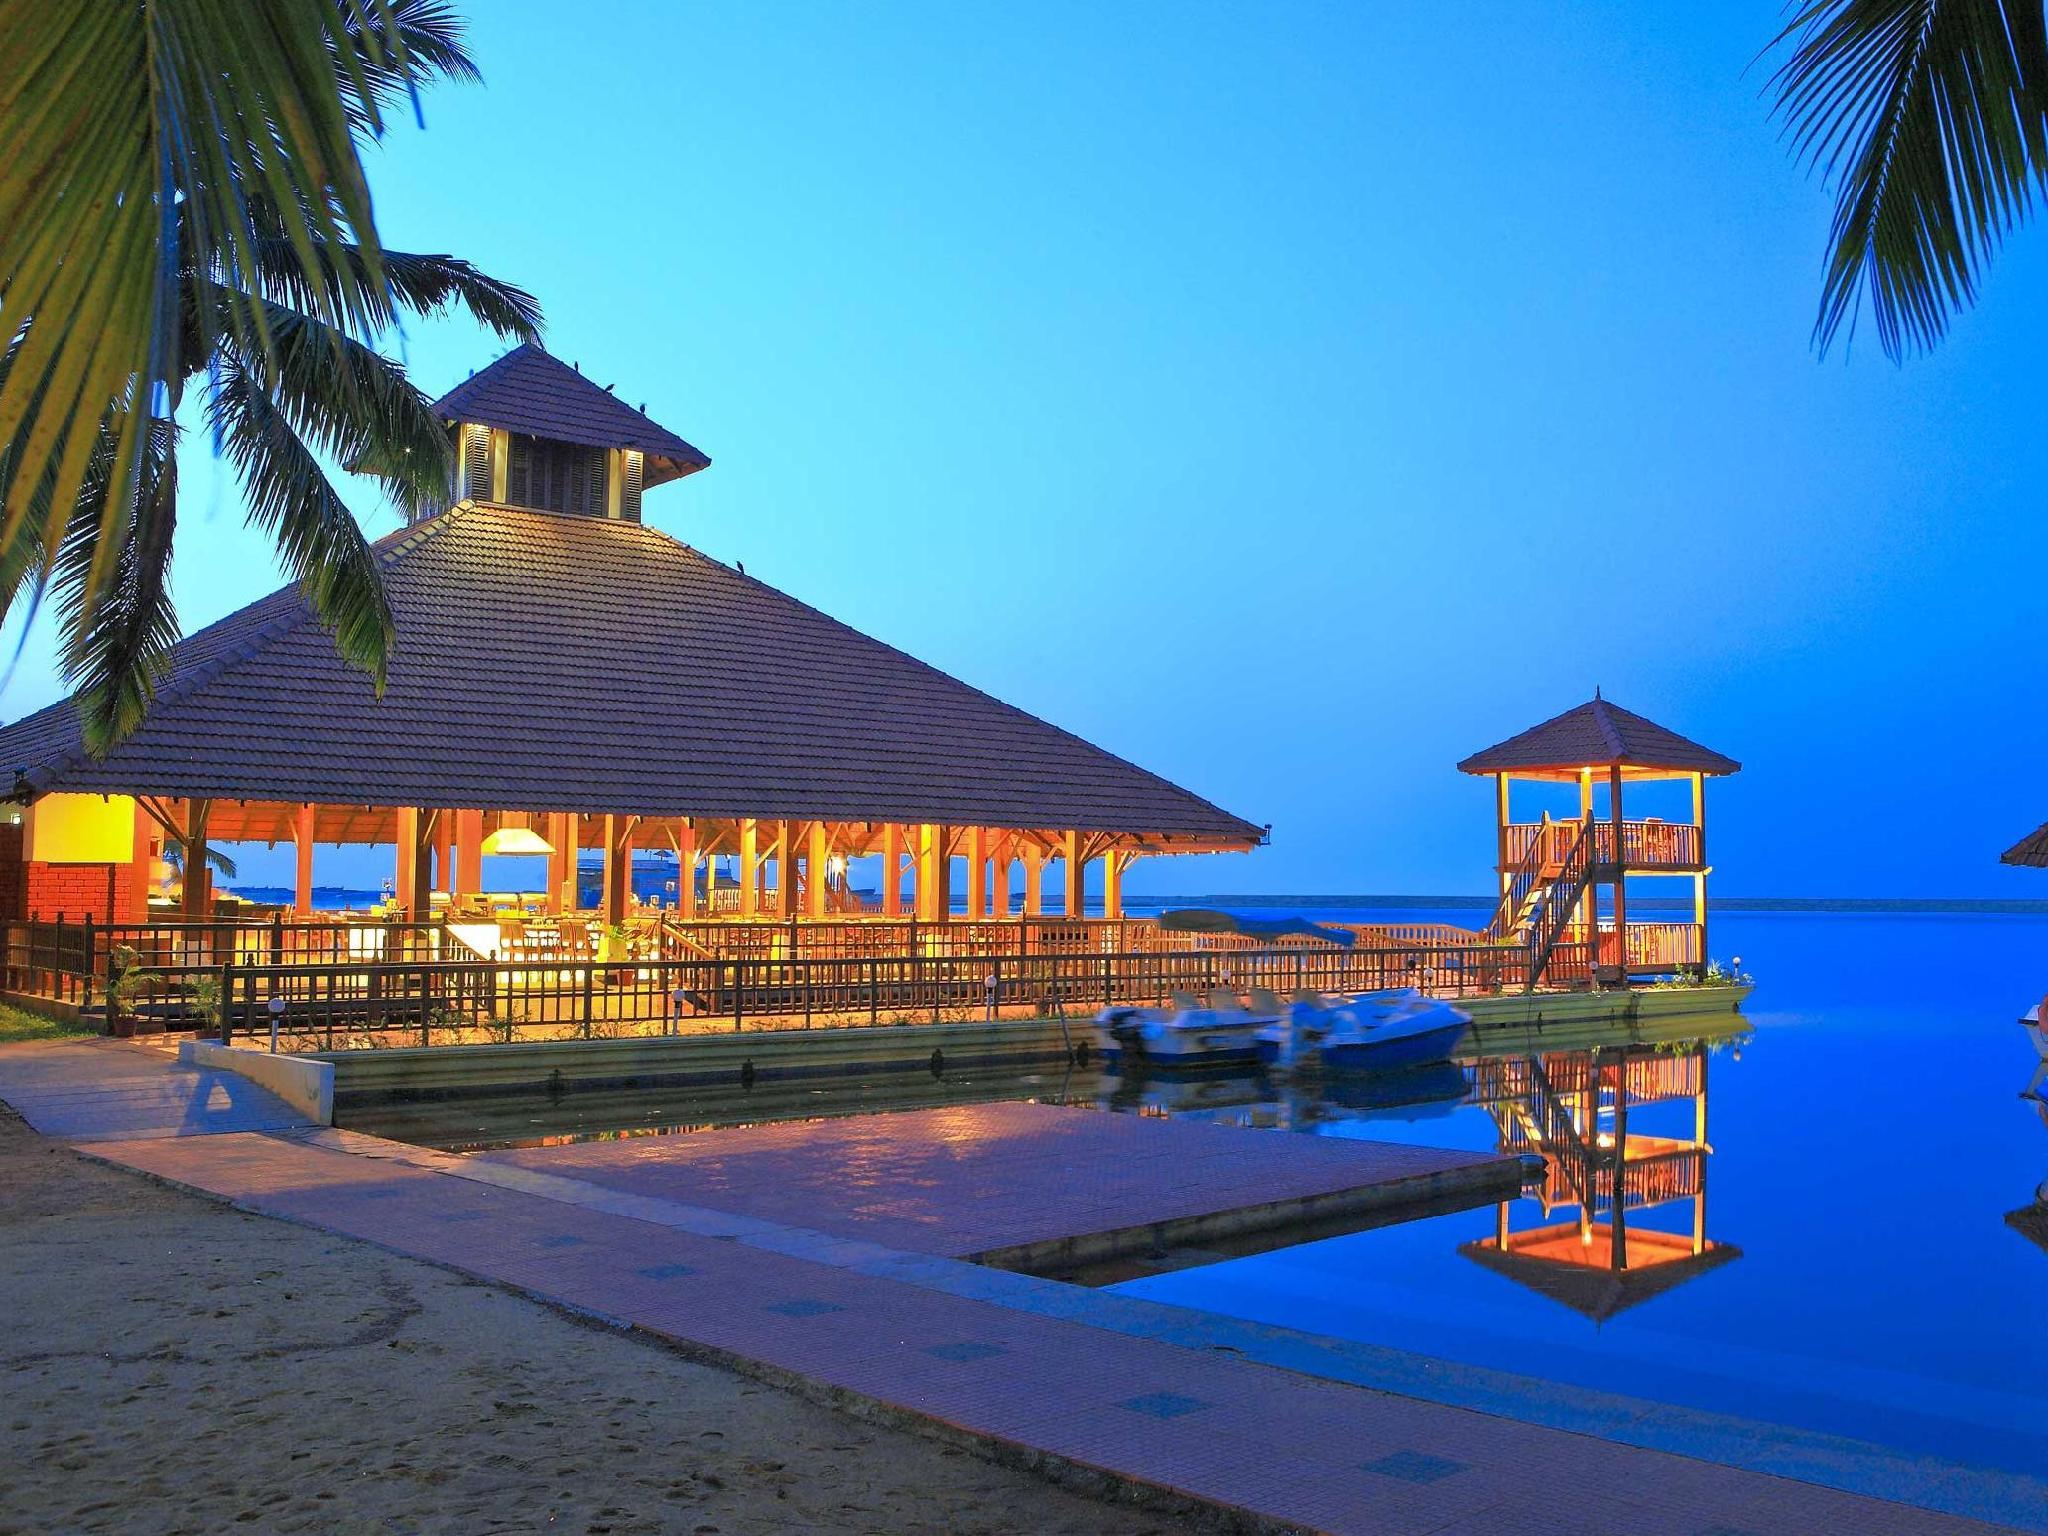 Estuary island resort photos